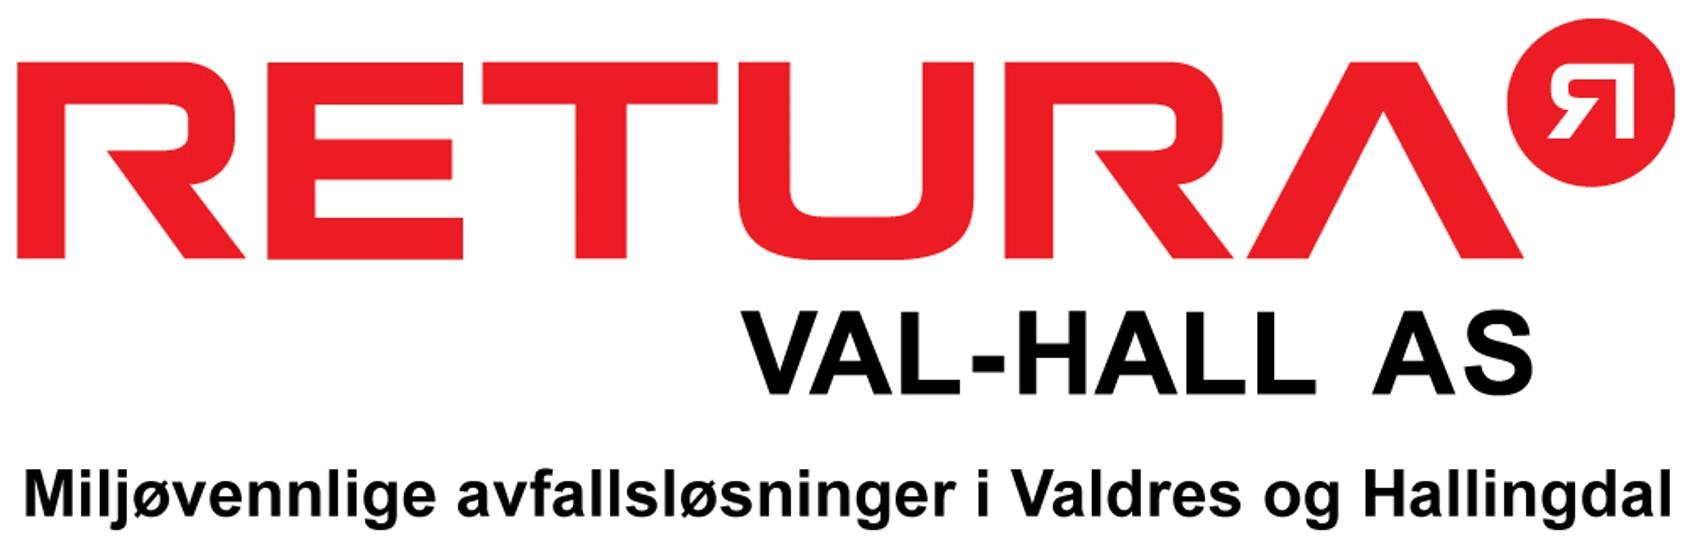 Retura Val-Hall